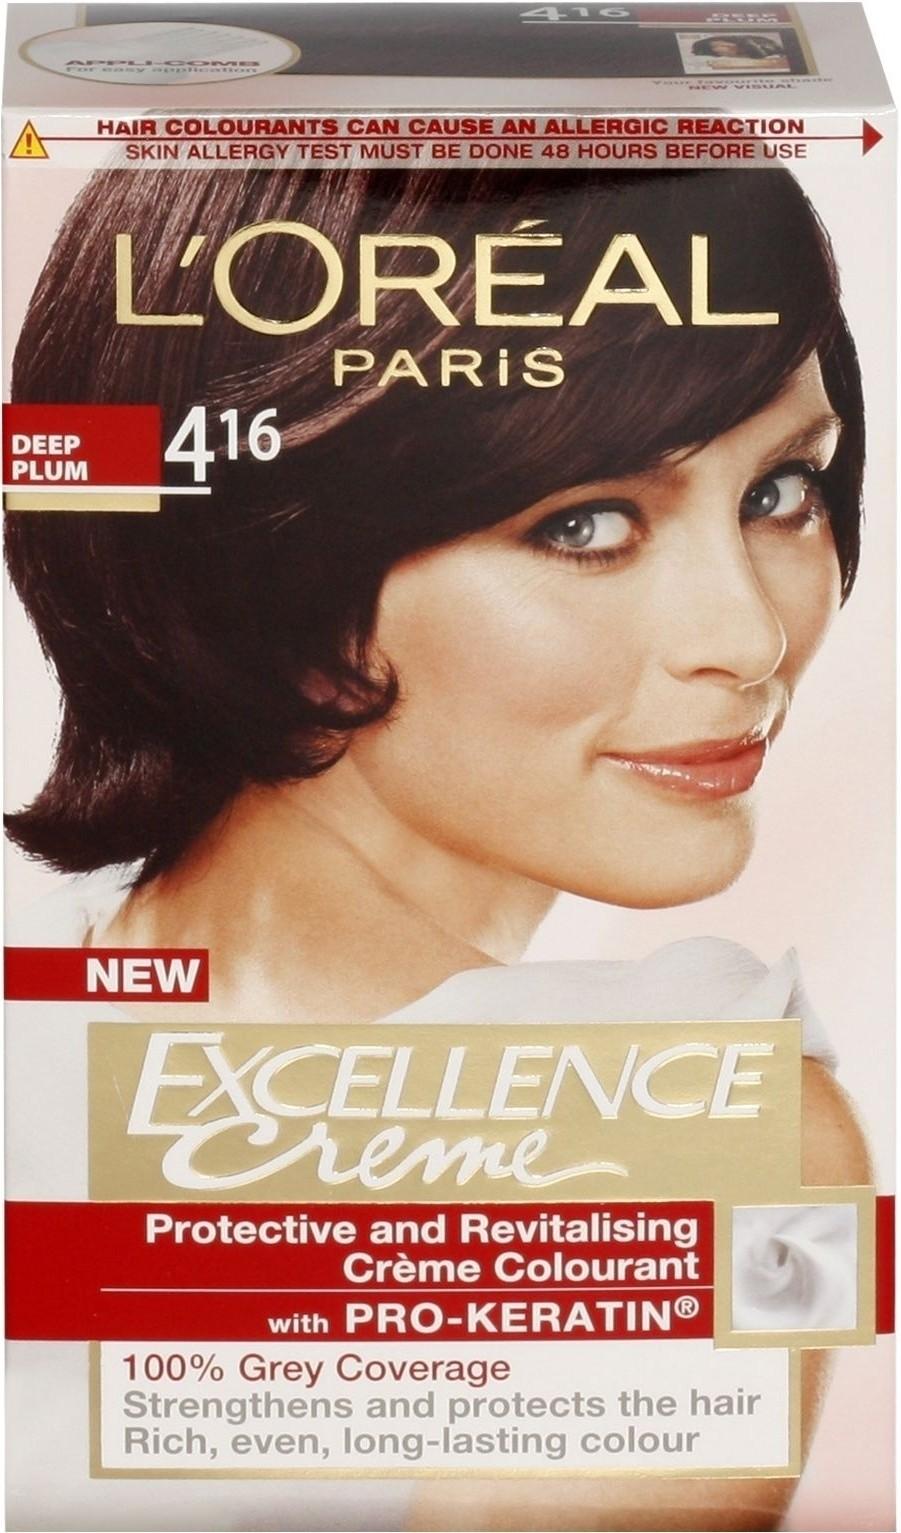 6b283e712 Buy Loreal Paris Excellence Creme Hair Color Deep Plum - 4.16   ₹ 559 by Loreal  Paris from Flipkart